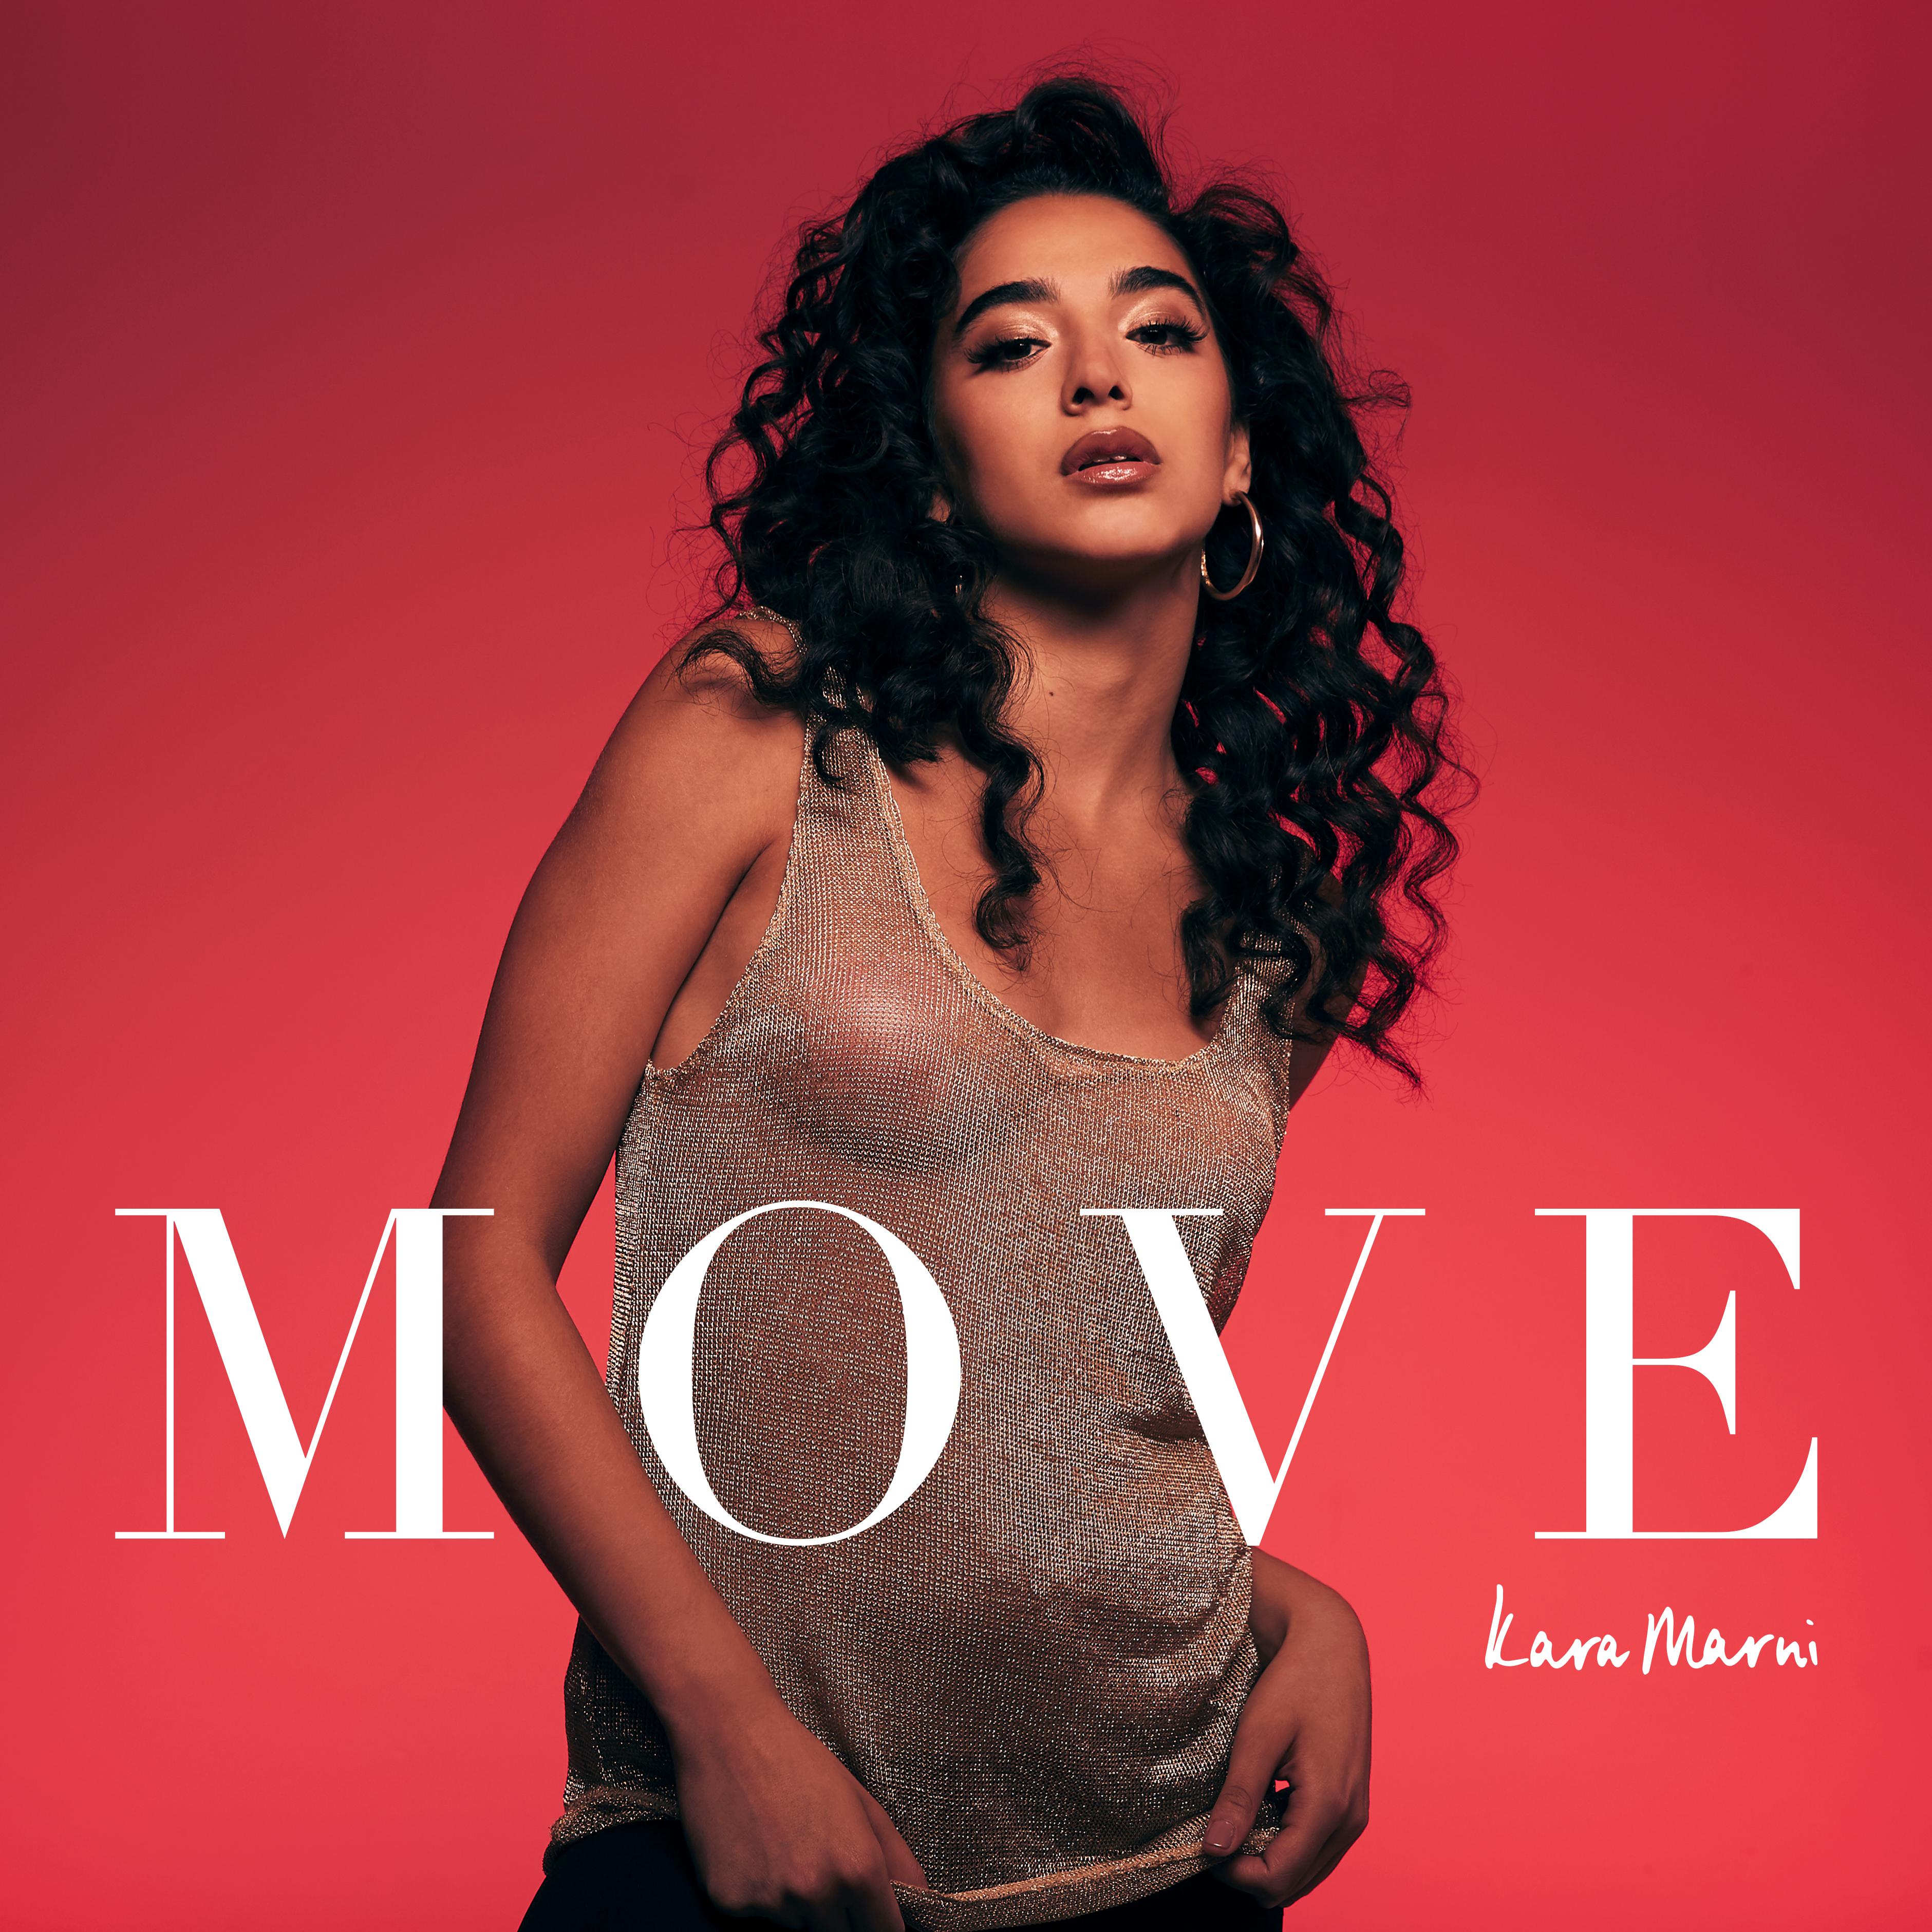 Move (Download) - Kara Marni